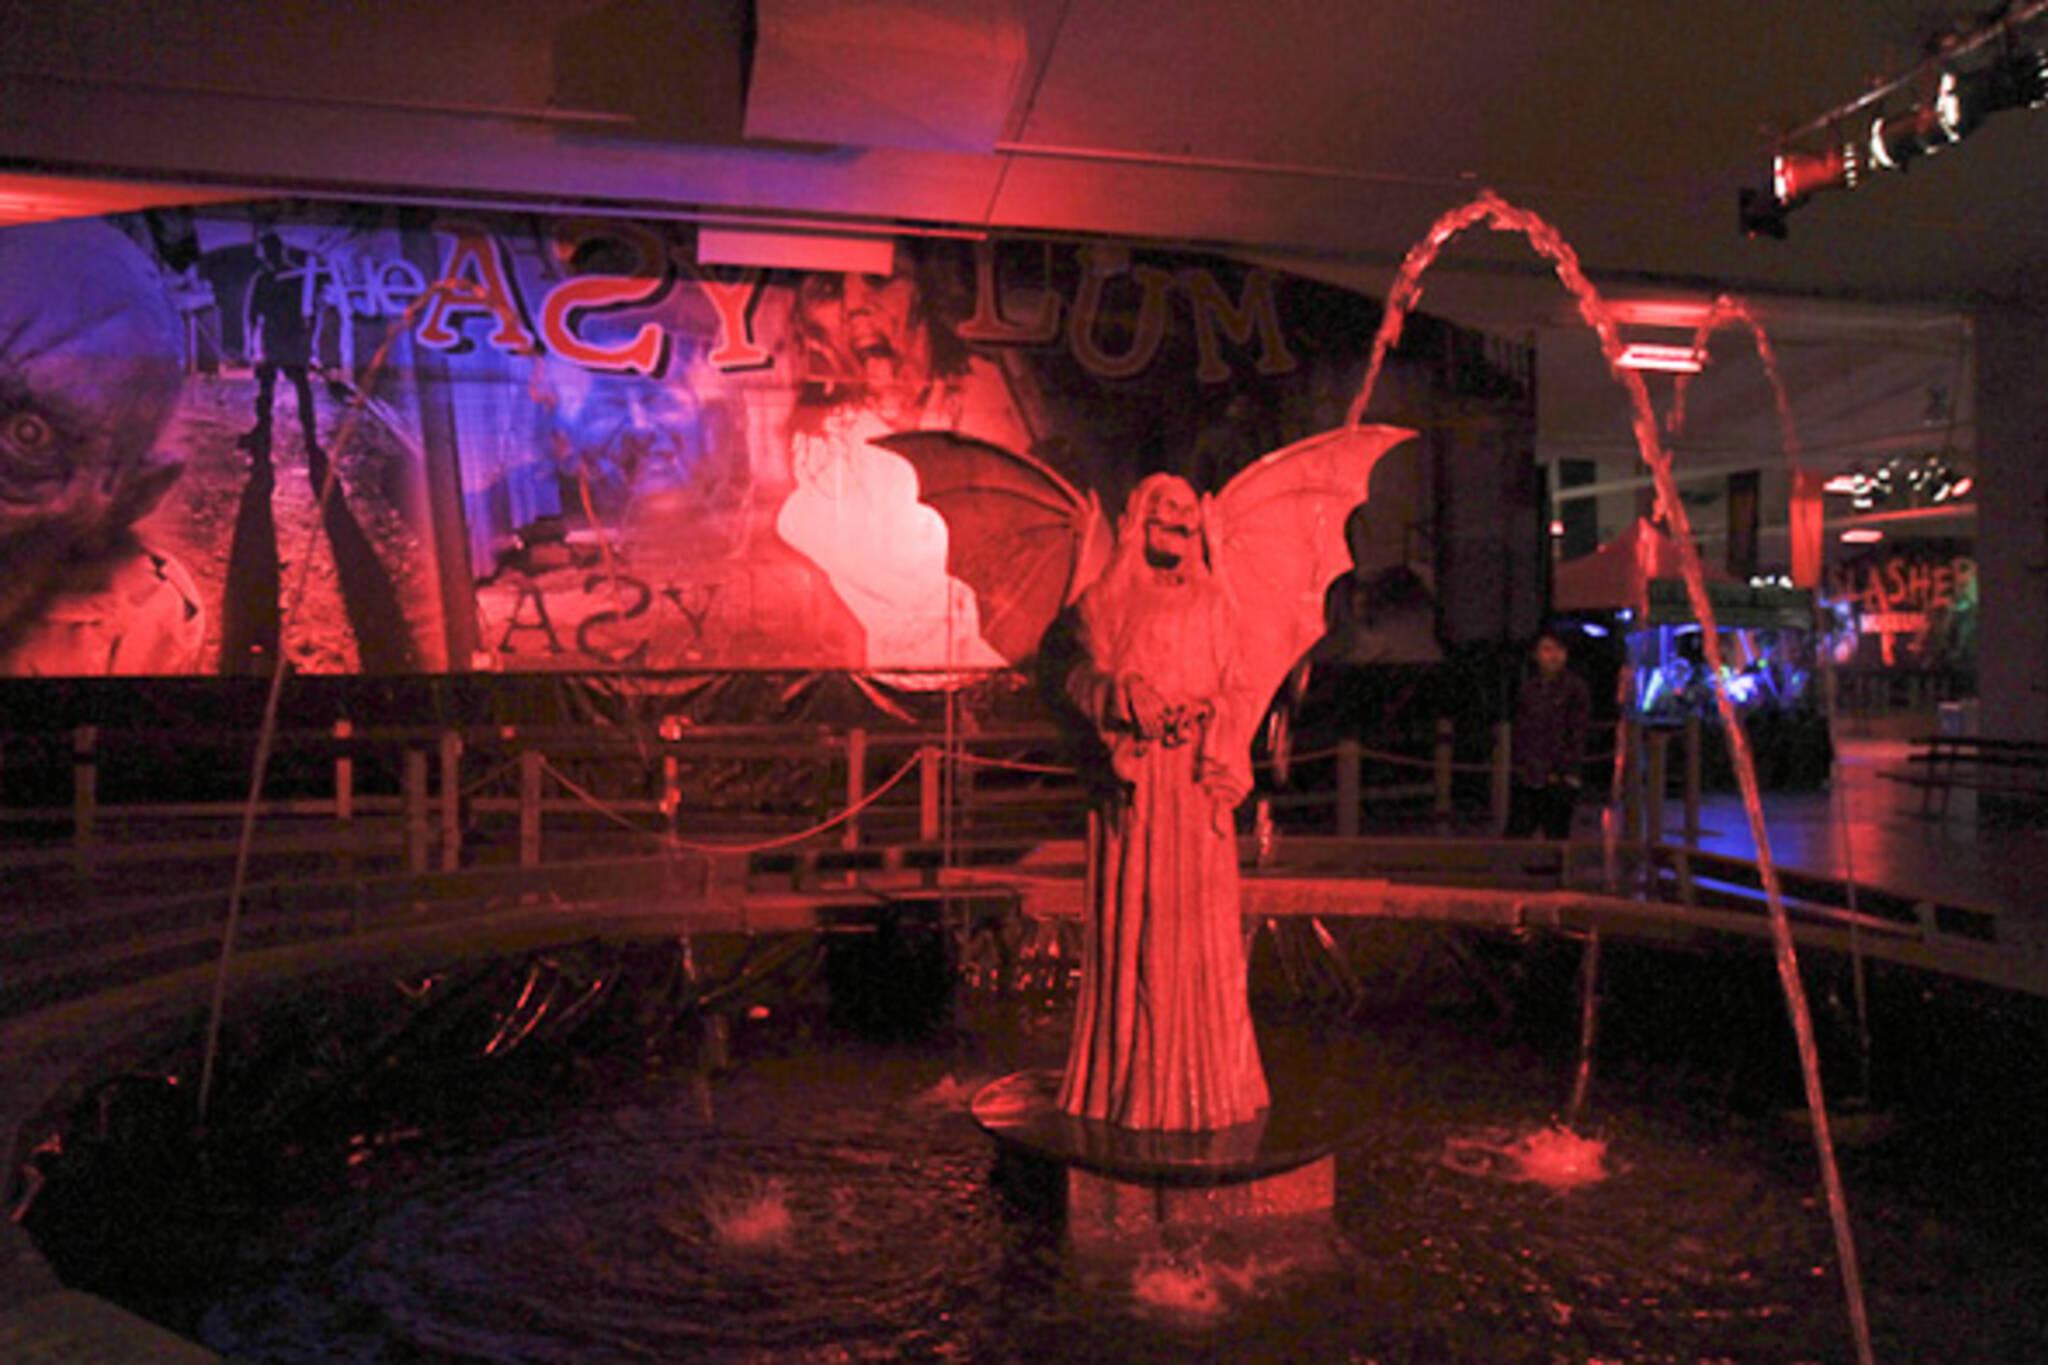 haunted house toronto